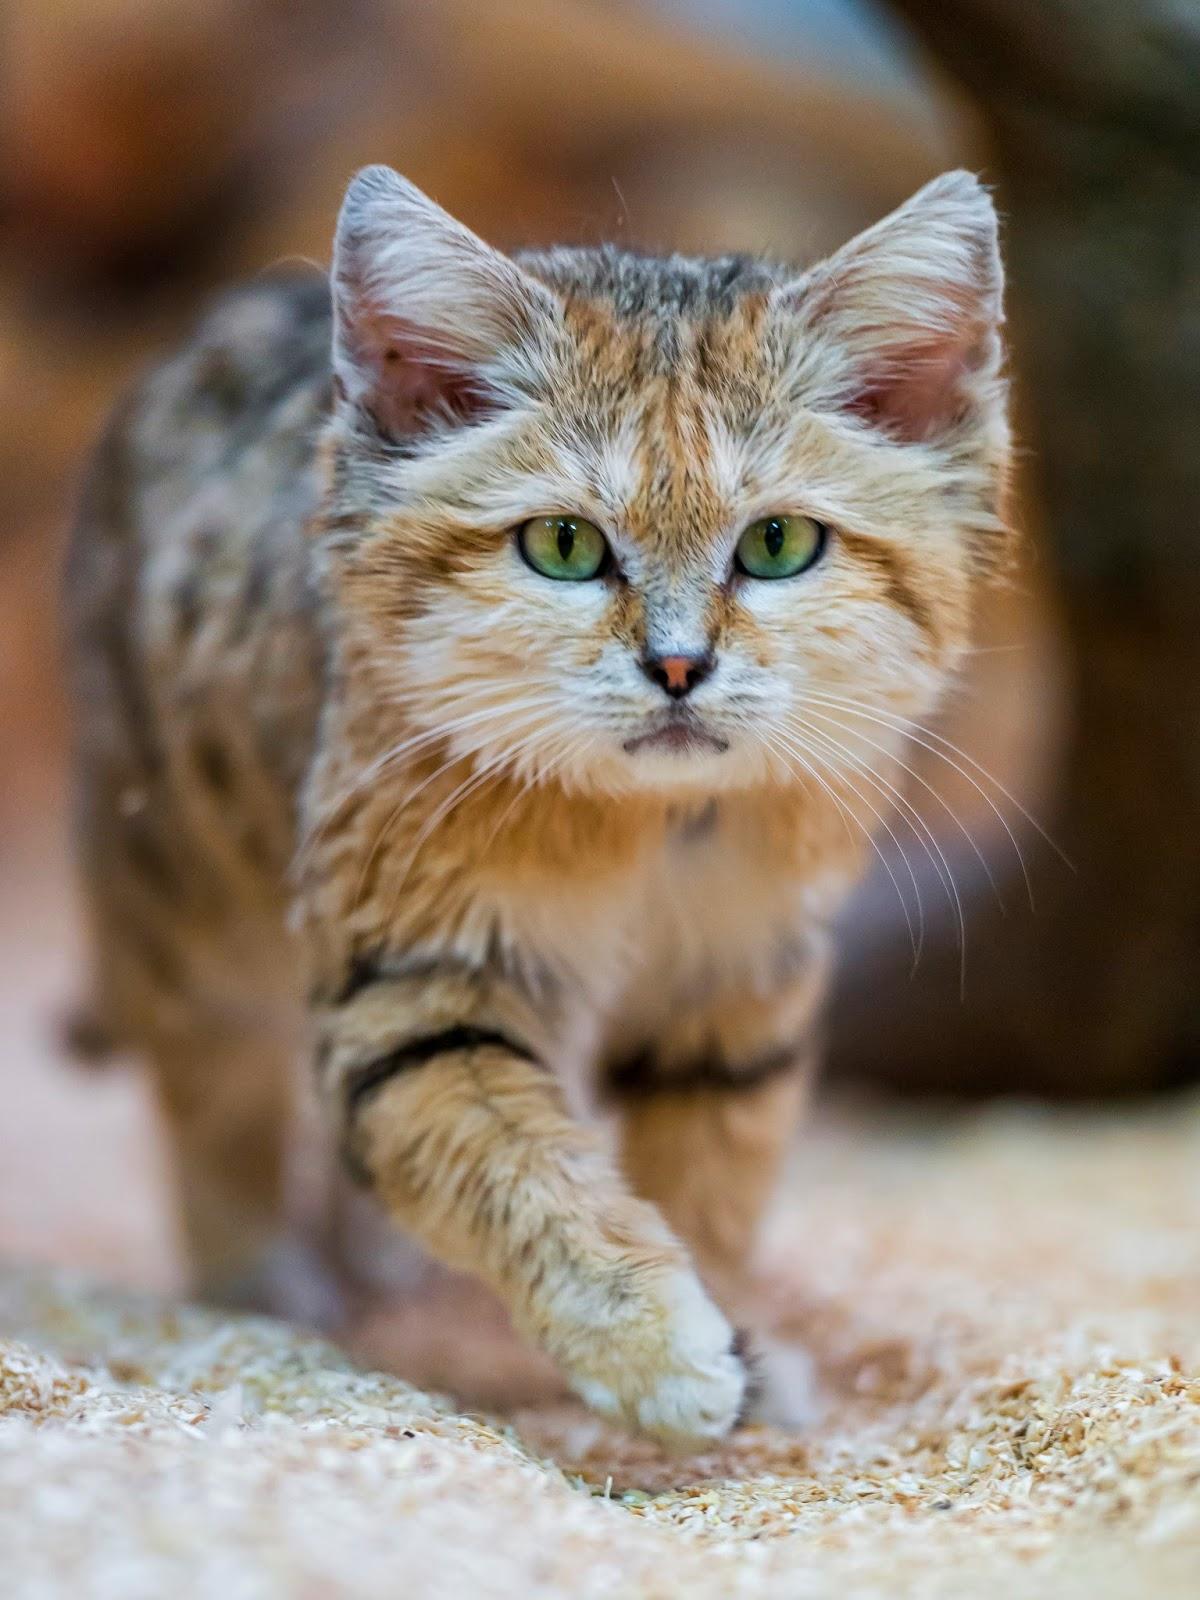 Cat Tracking Cat Litter Eerywhere